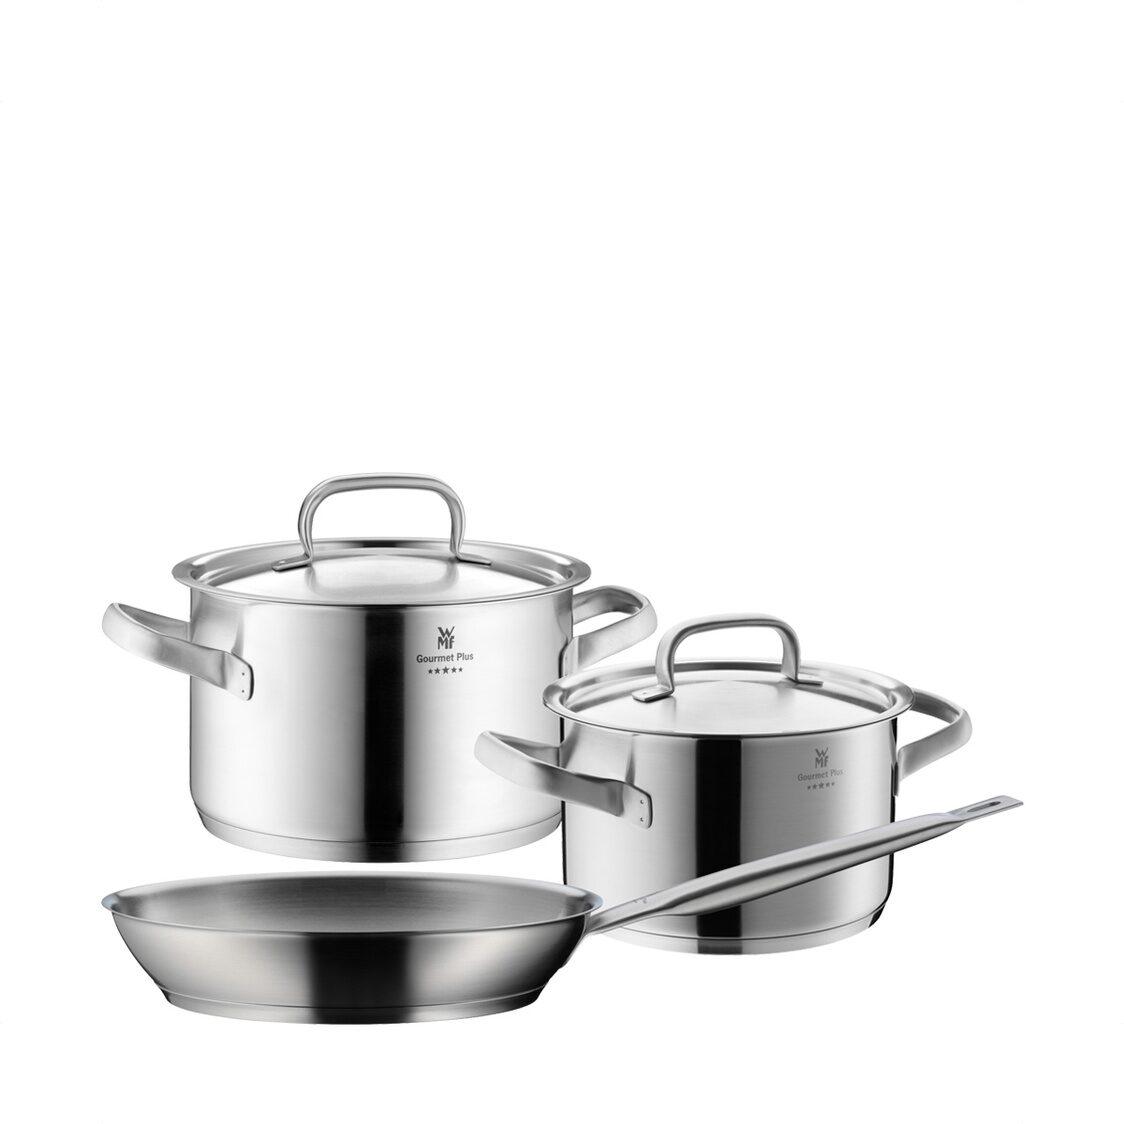 WMF Gourmet Plus 3pc Cookware Set